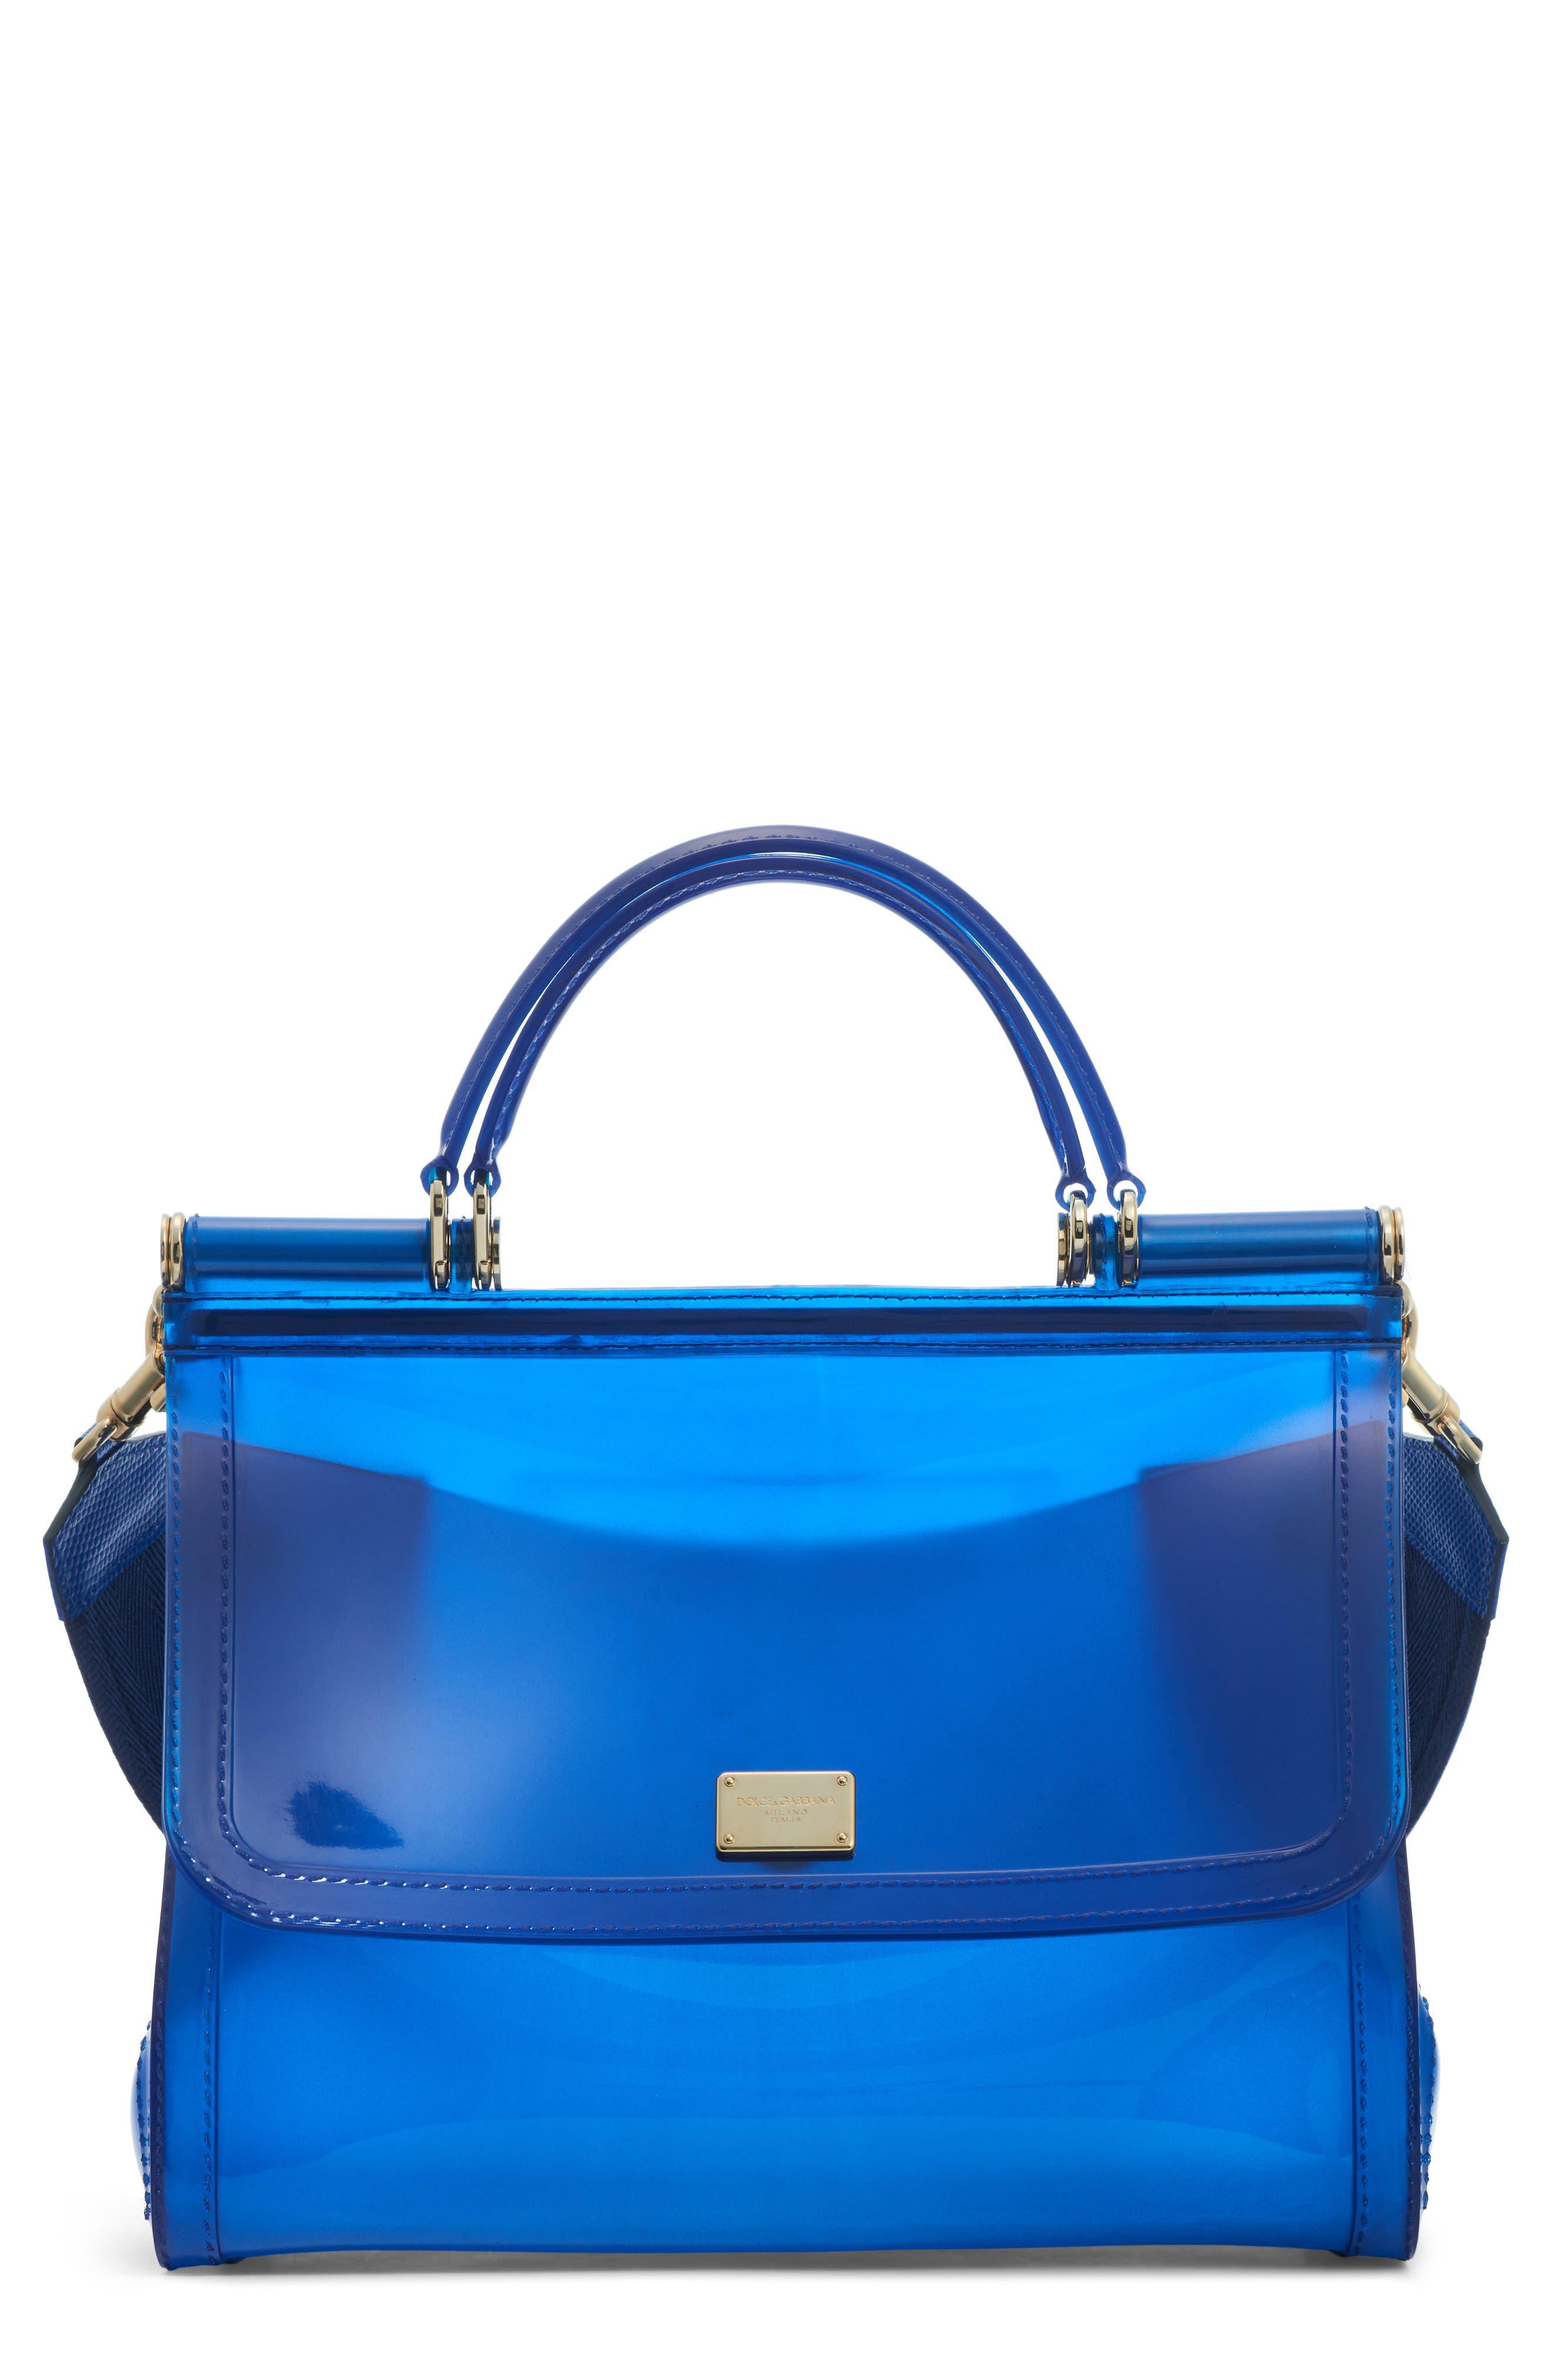 Medium Miss Sicily PVC Satchel,                         Main,                         color, BLUE MULTI